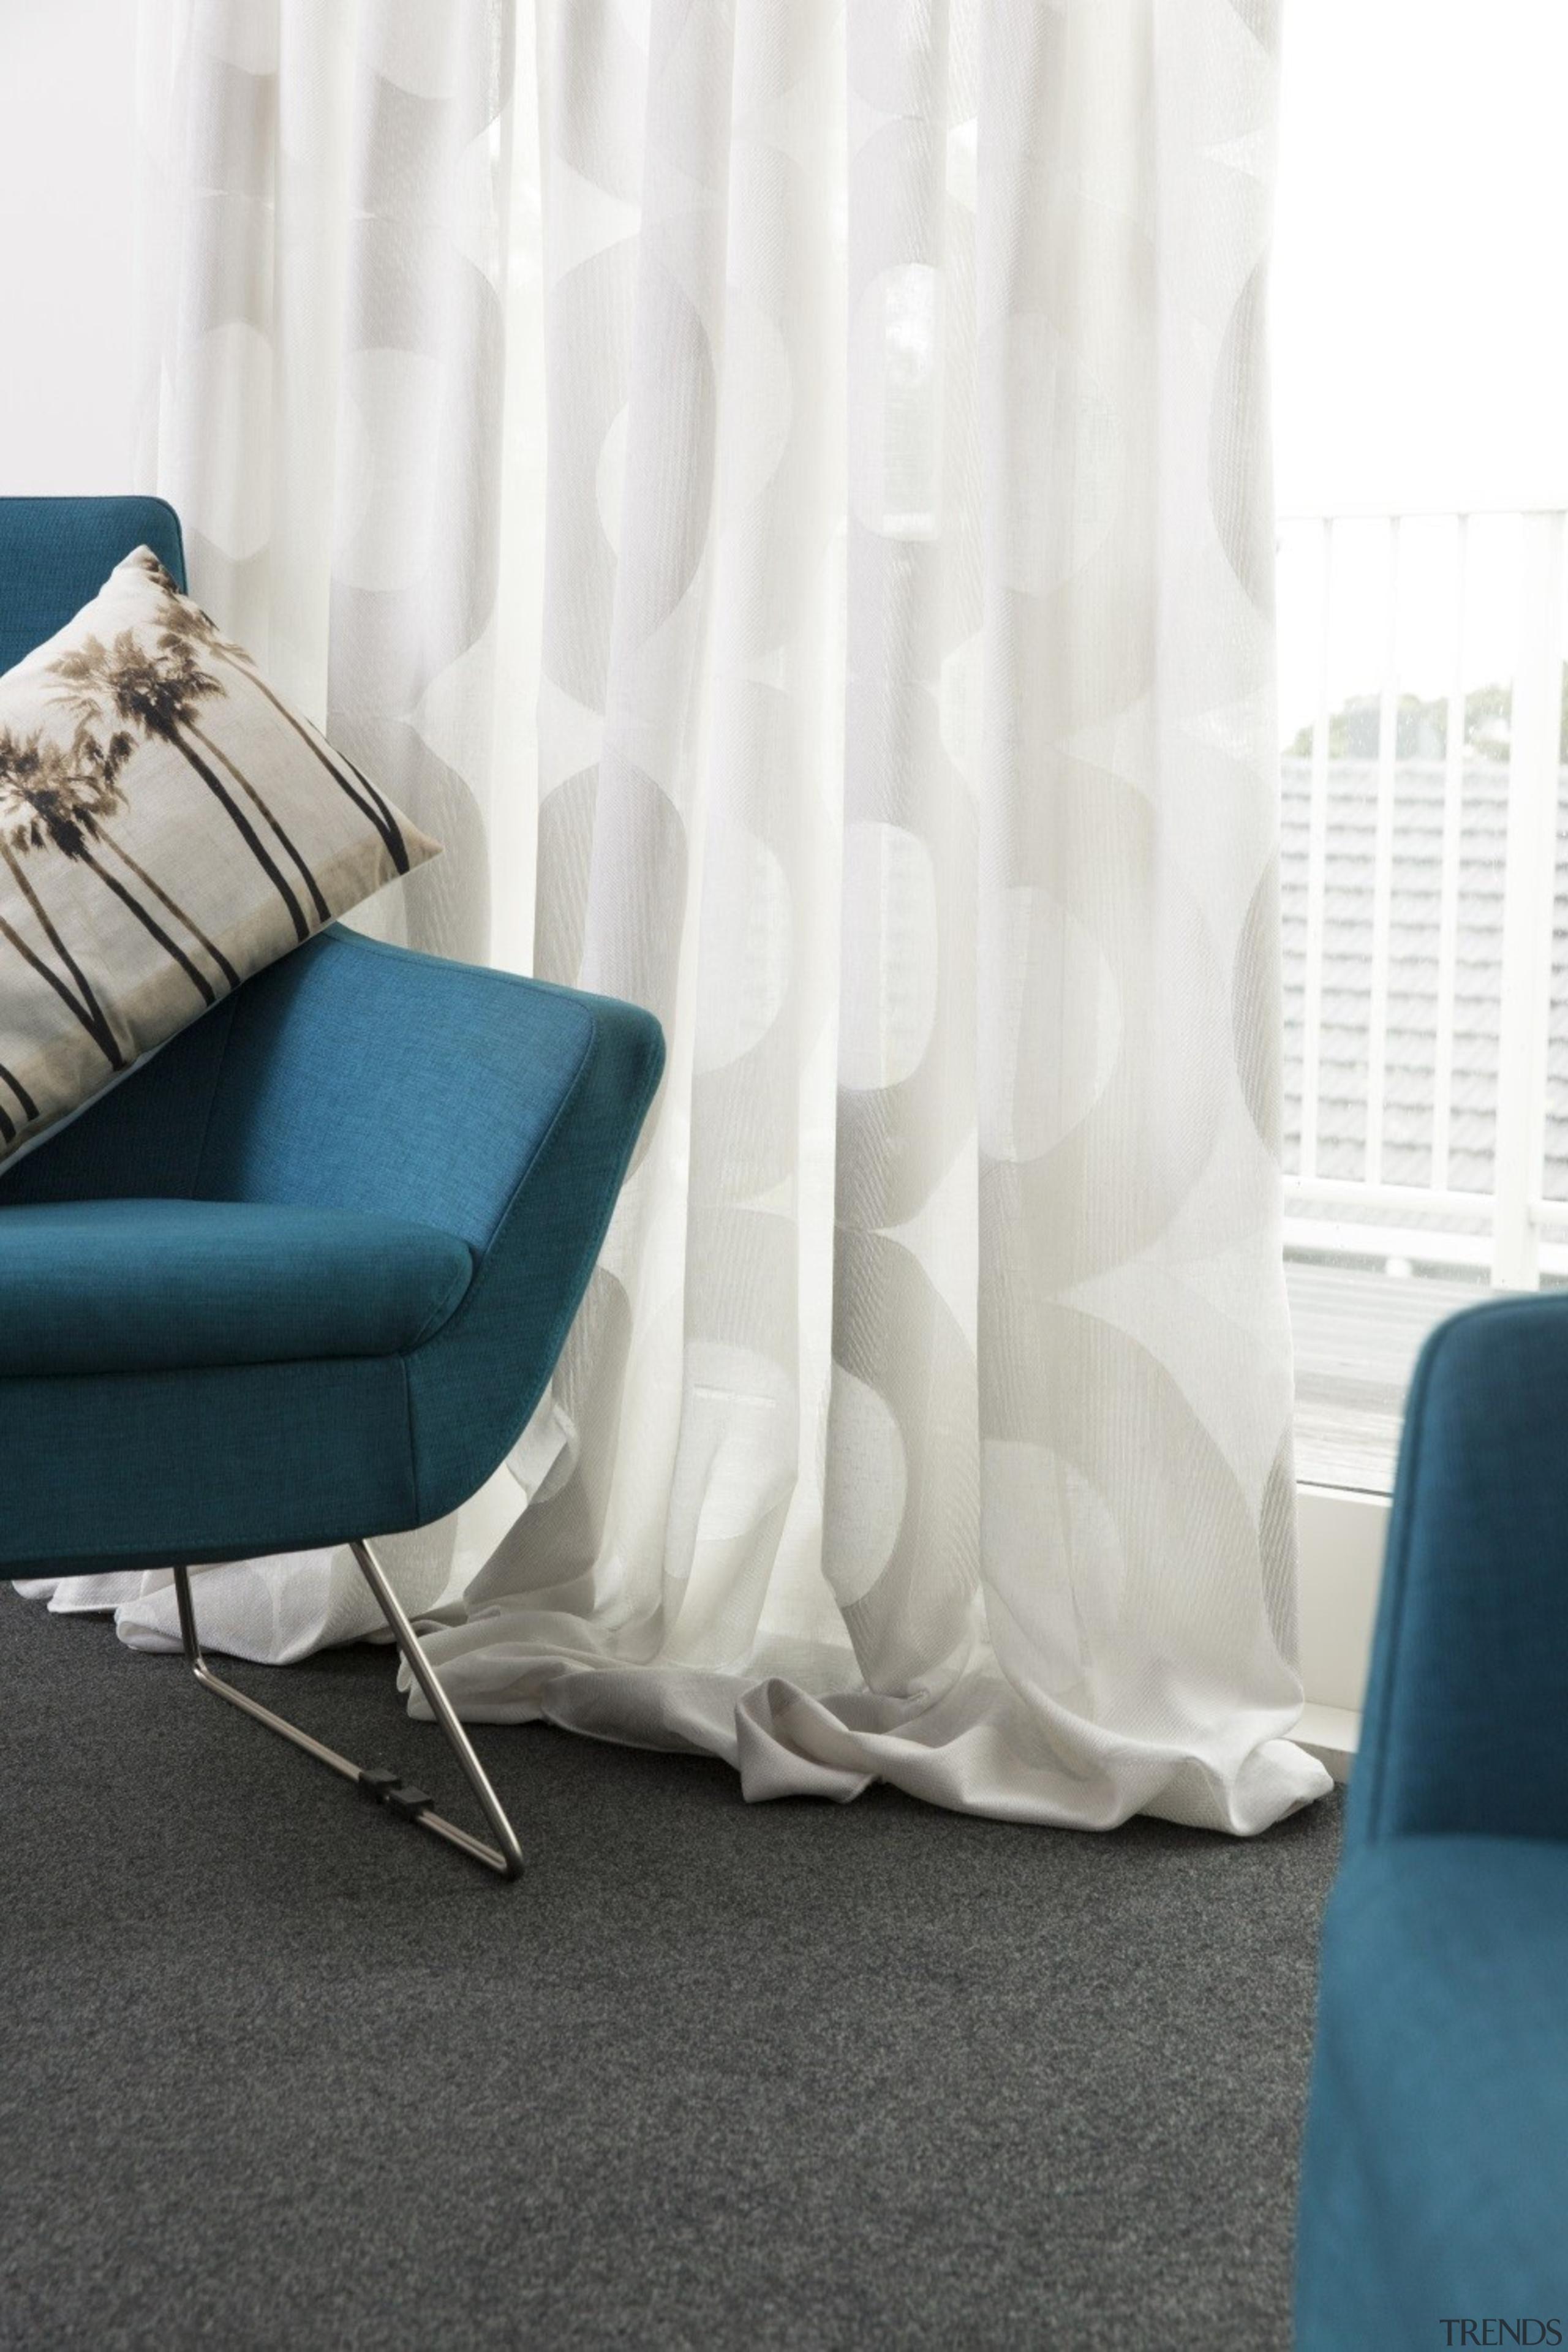 Harrisons Curtains - Harrisons Curtains - chair   chair, couch, curtain, cushion, floor, flooring, furniture, interior design, product, textile, window treatment, white